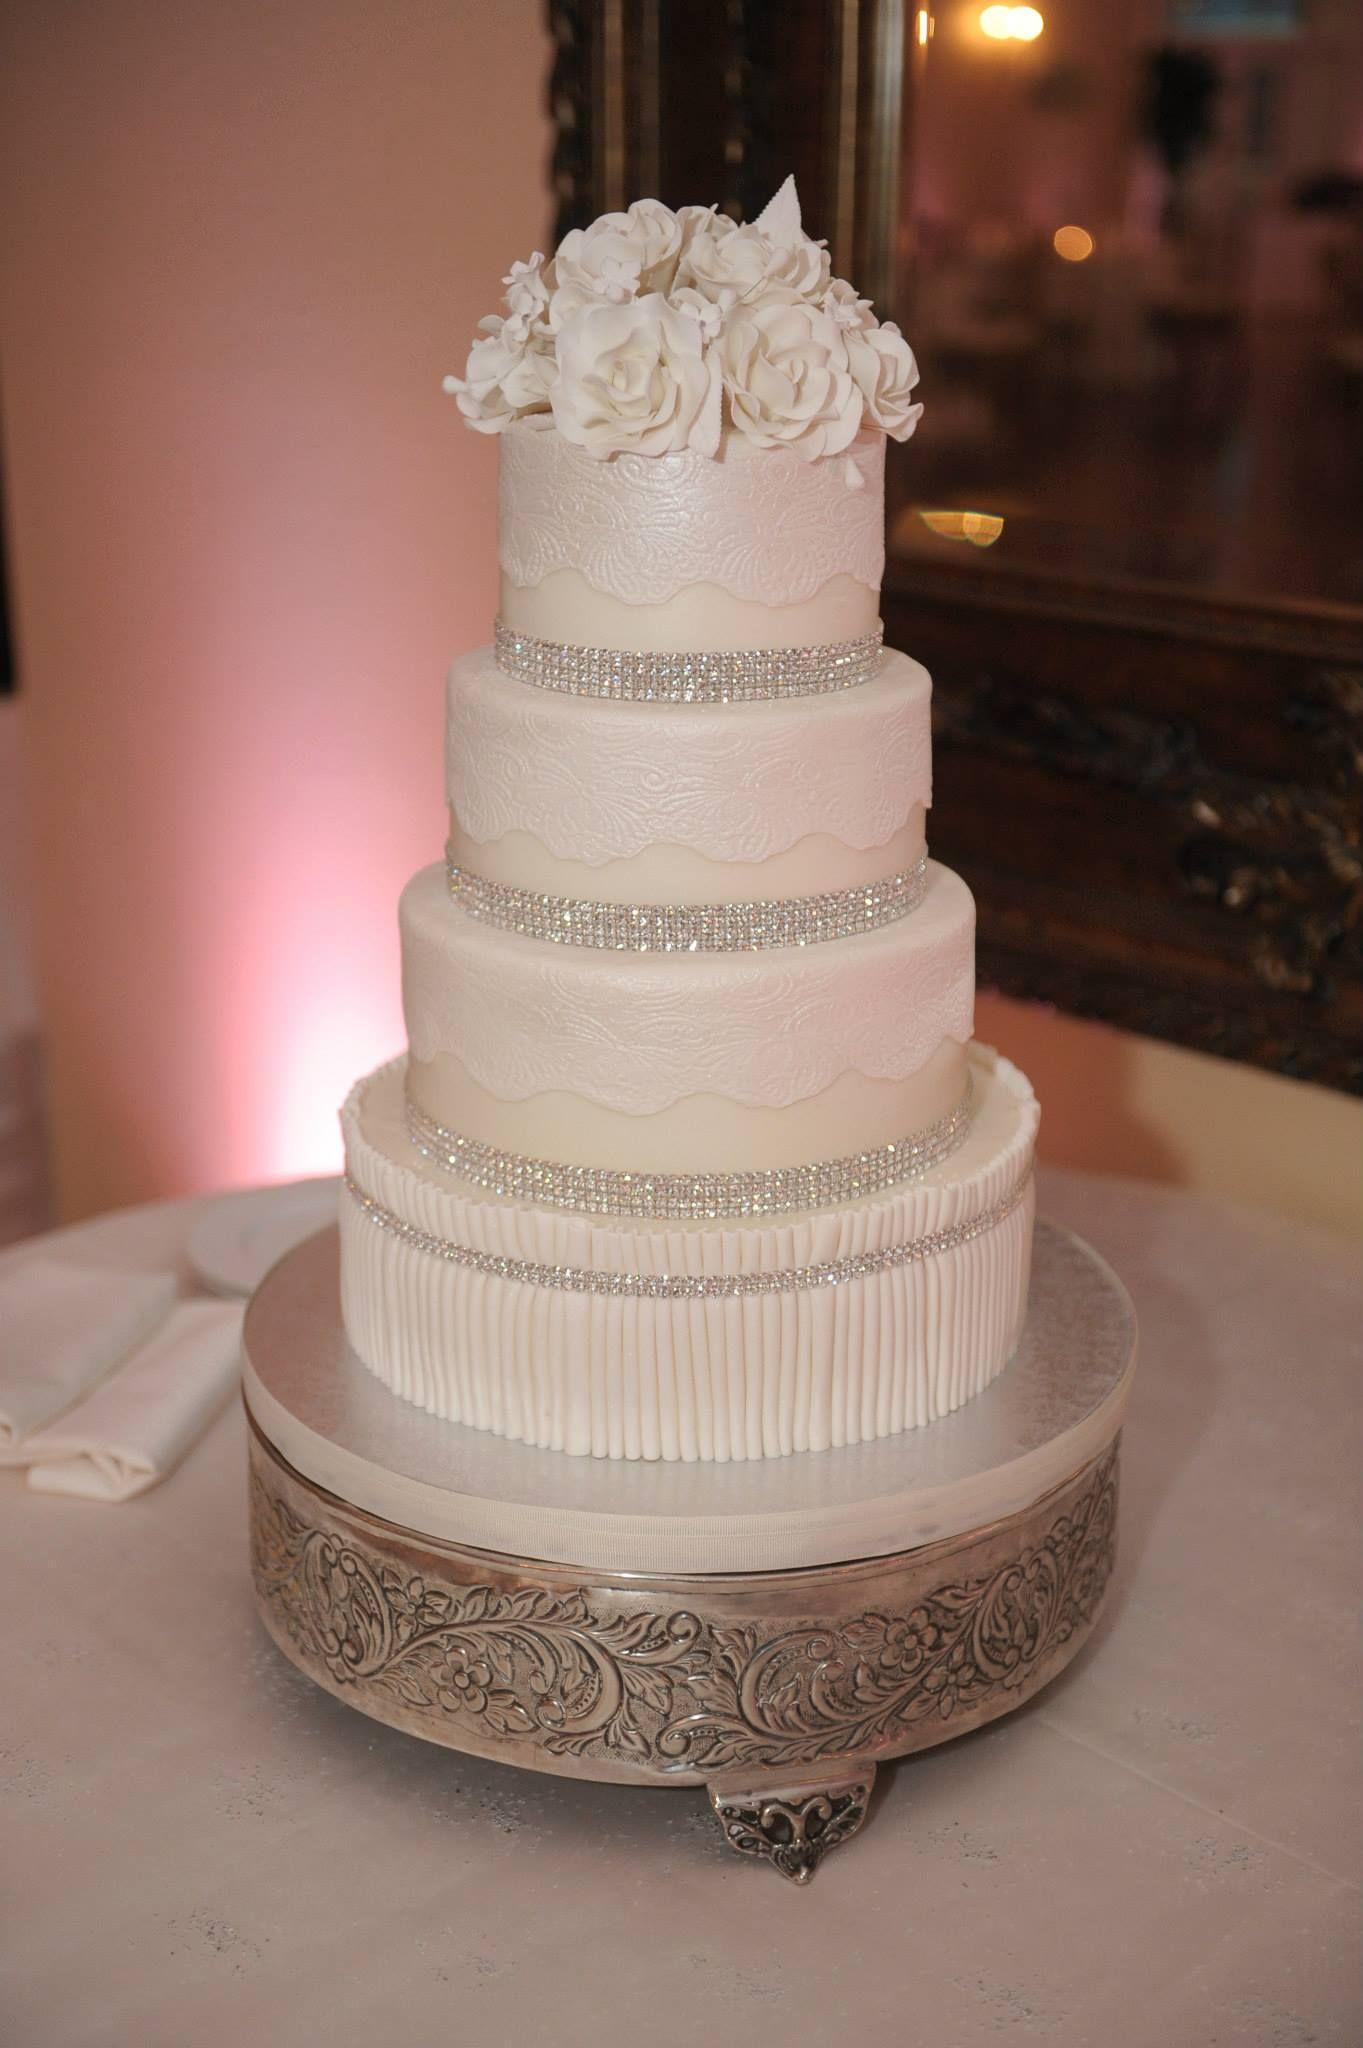 Wedding Planners - Eventrics Weddings | Venue - The Lange Farm | Photography - Asaad {AI} Images | Event Design - The Event Source Weddings | Wedding Cake - Party Flavors Custom Cakes | Wedding Reception | Wedding Cake